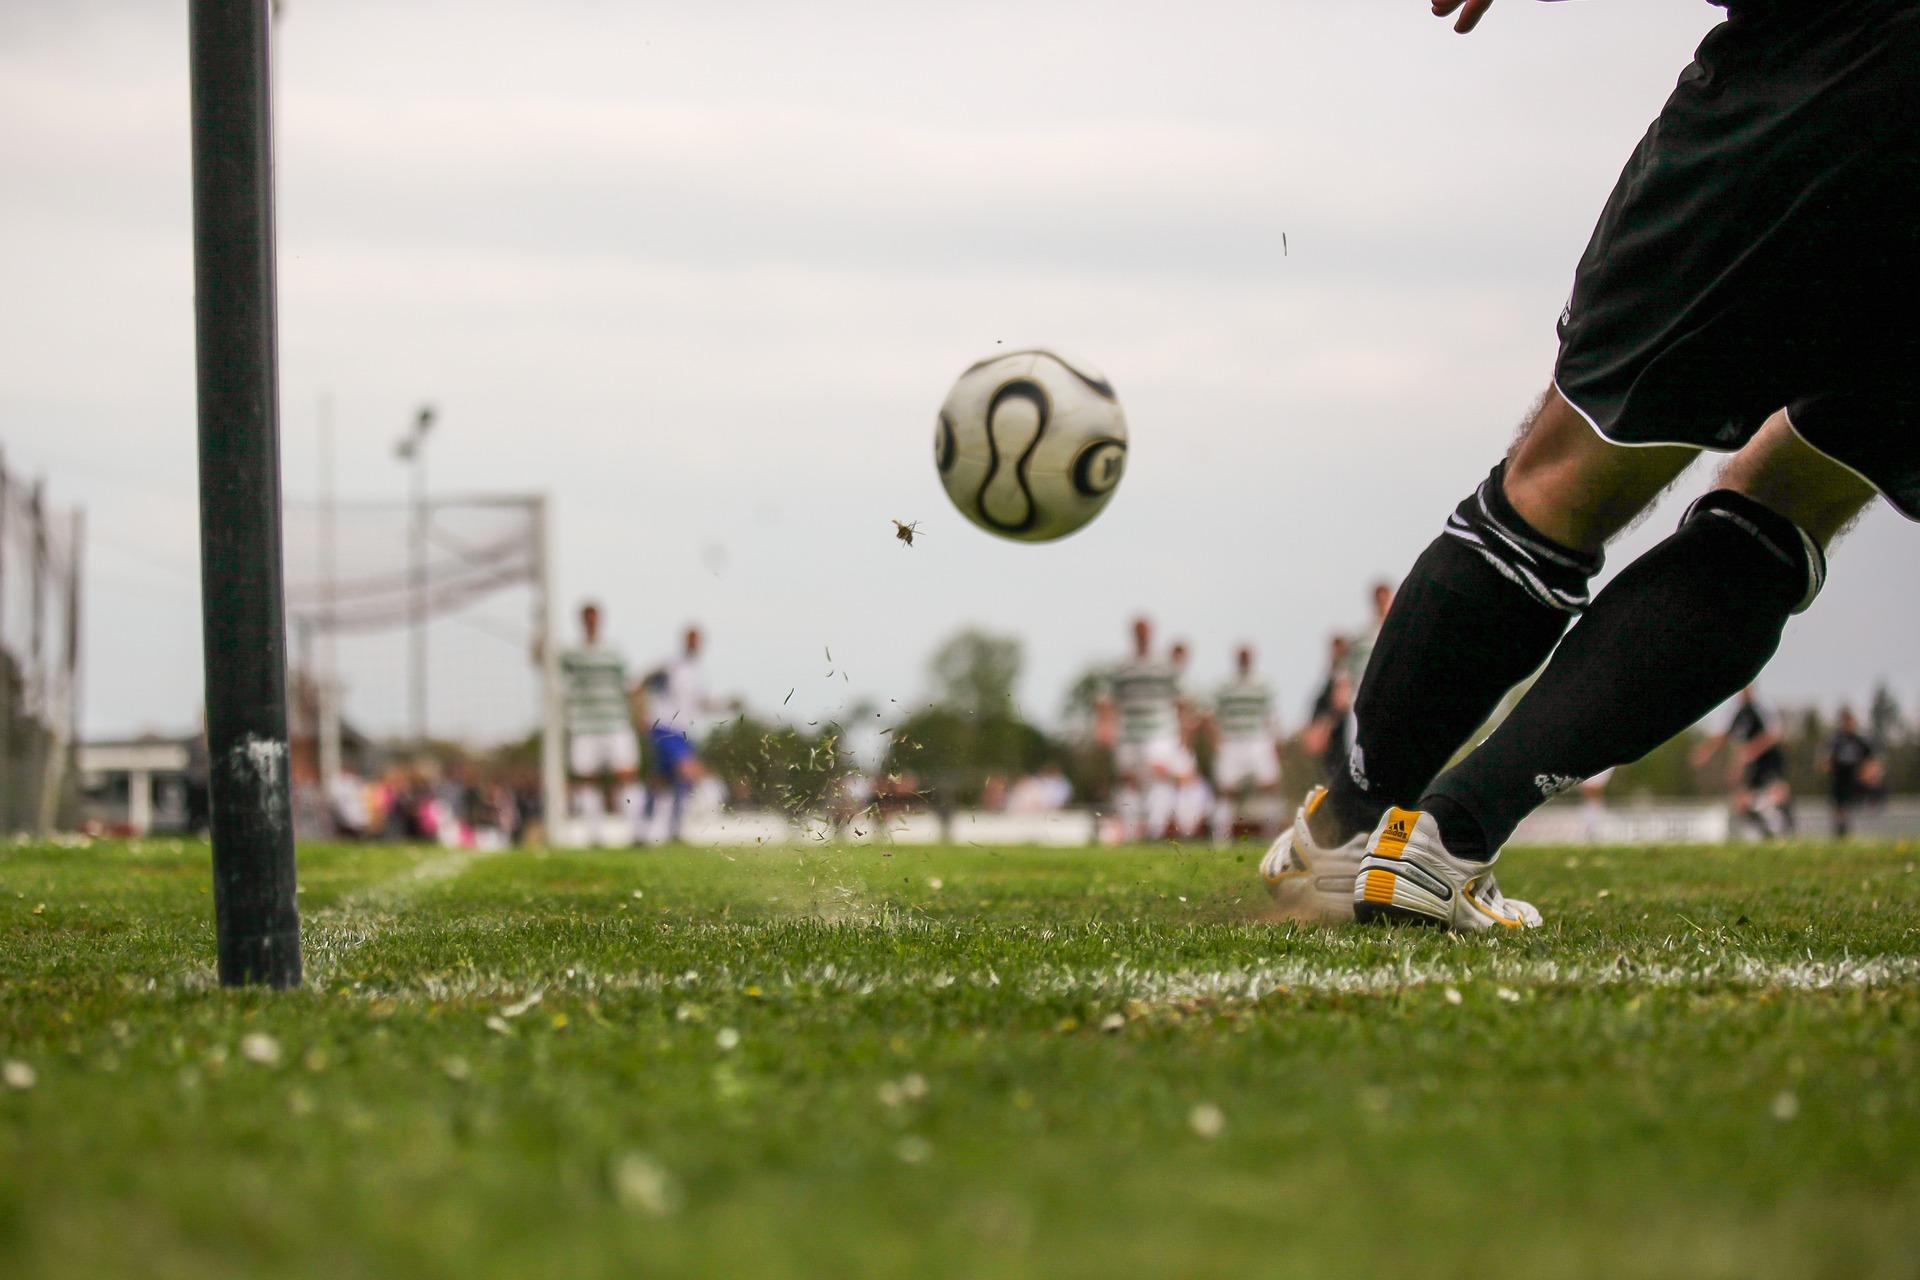 football-1678992_1920.jpg